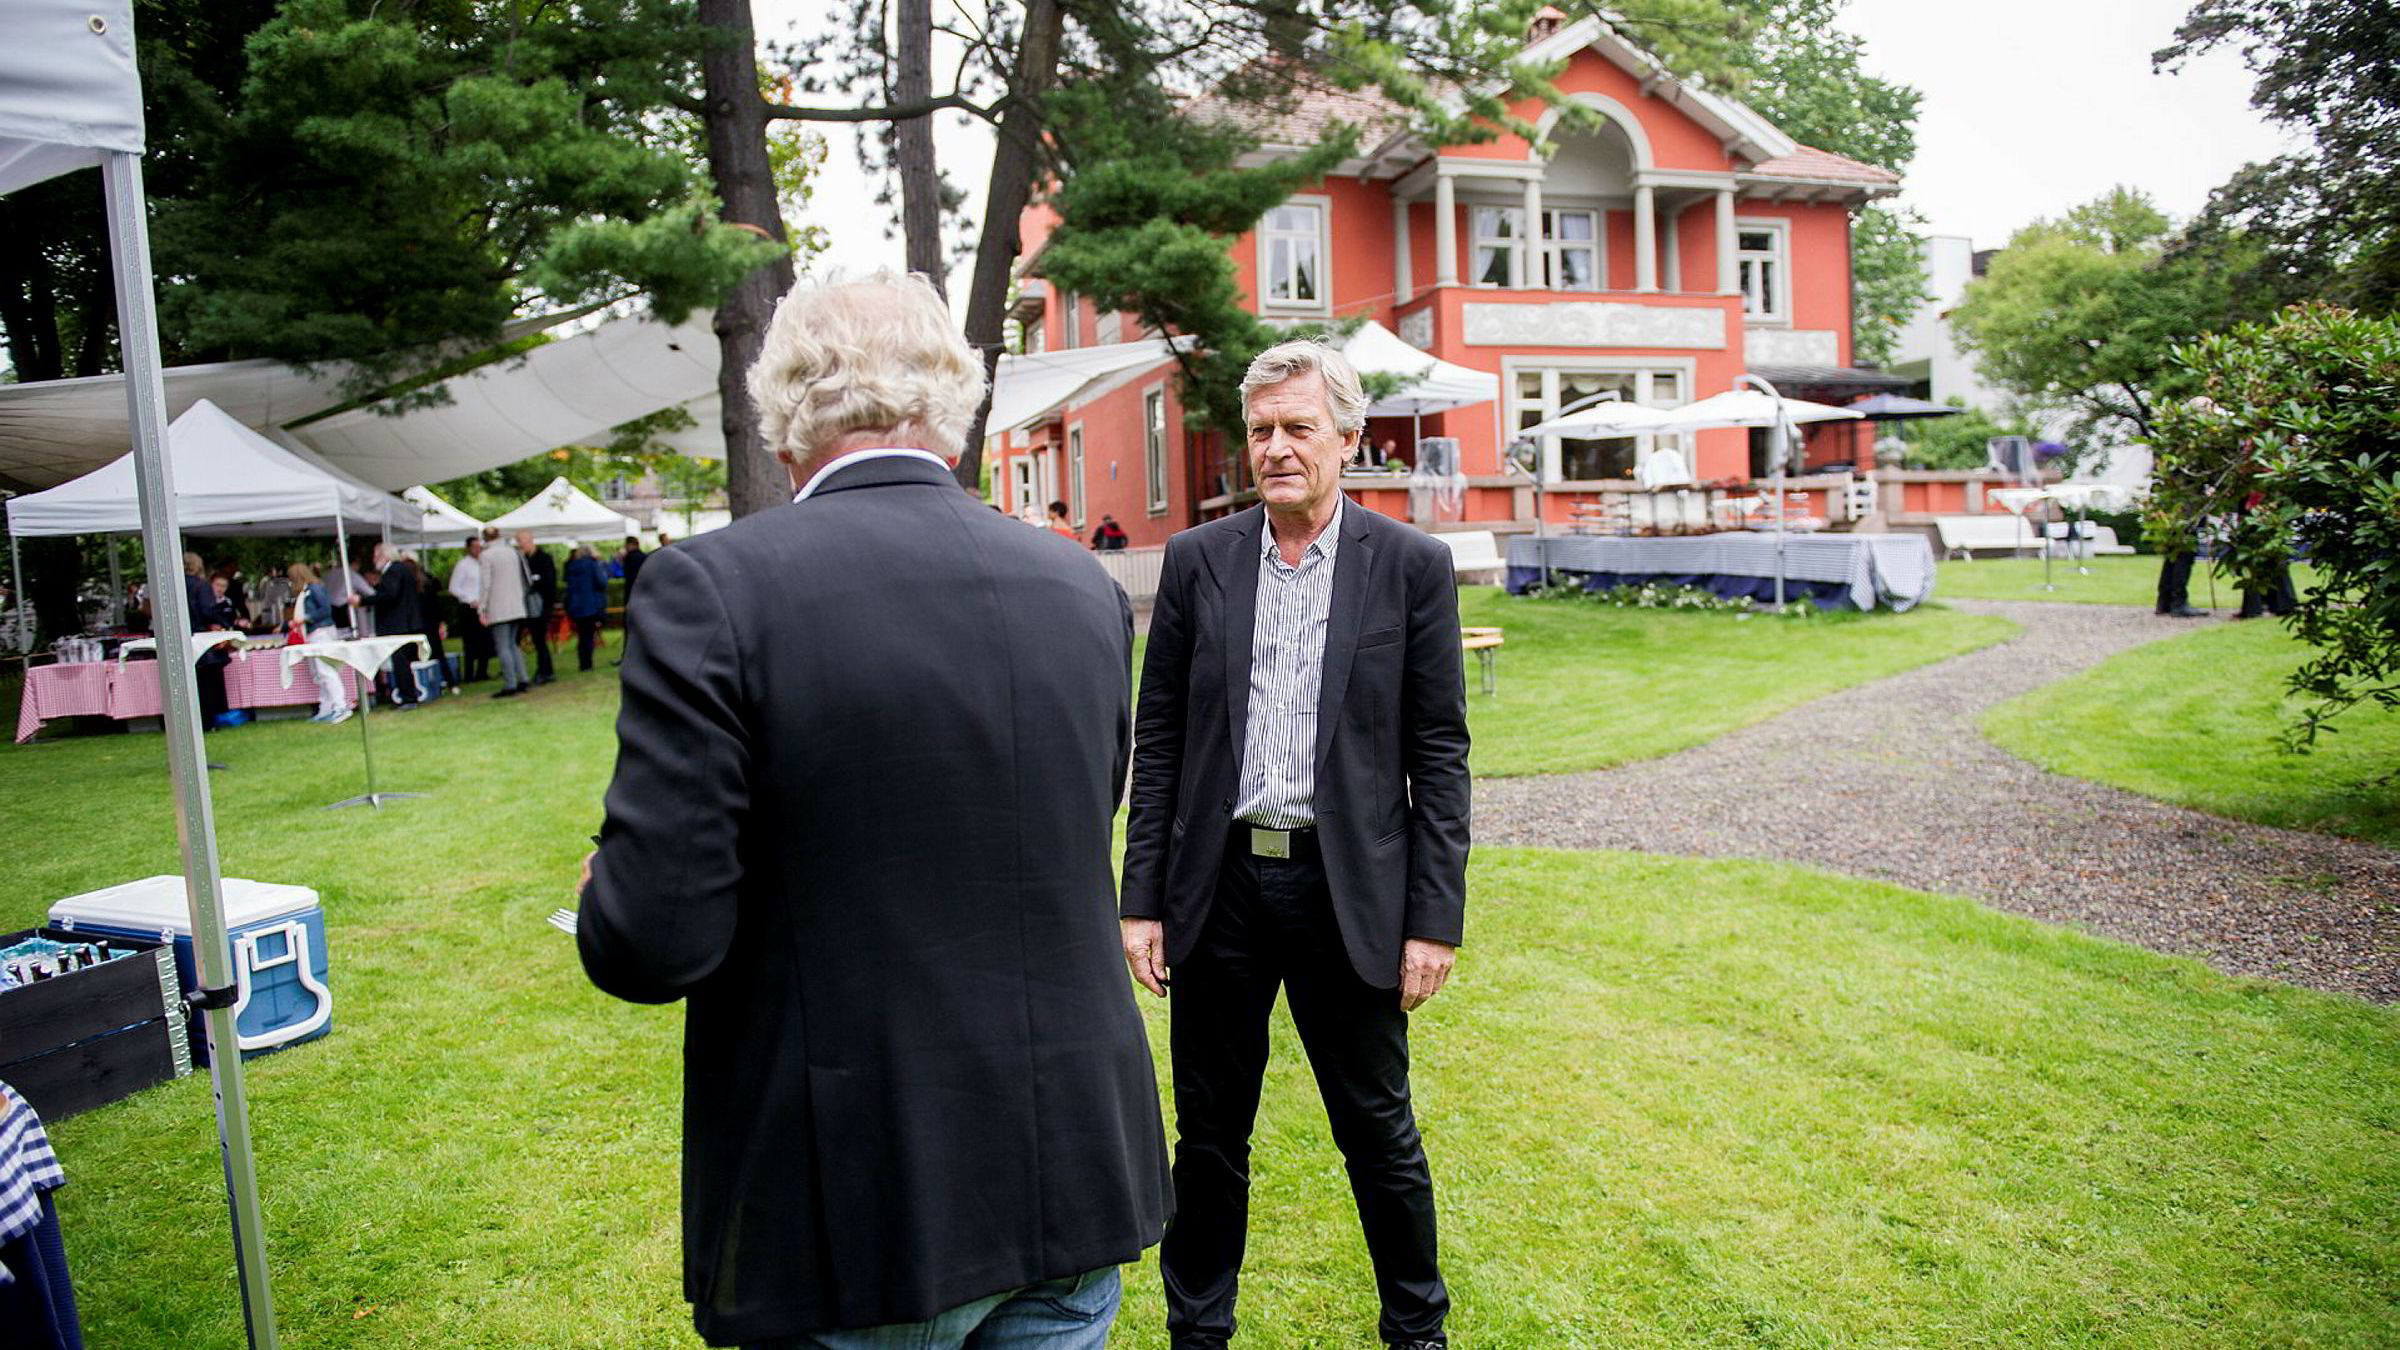 Forleggerforeningens Kristenn Einarsson møter William Nygaard (med ryggen til) på den årlige hagefesten utenfor Aschehougs villa.